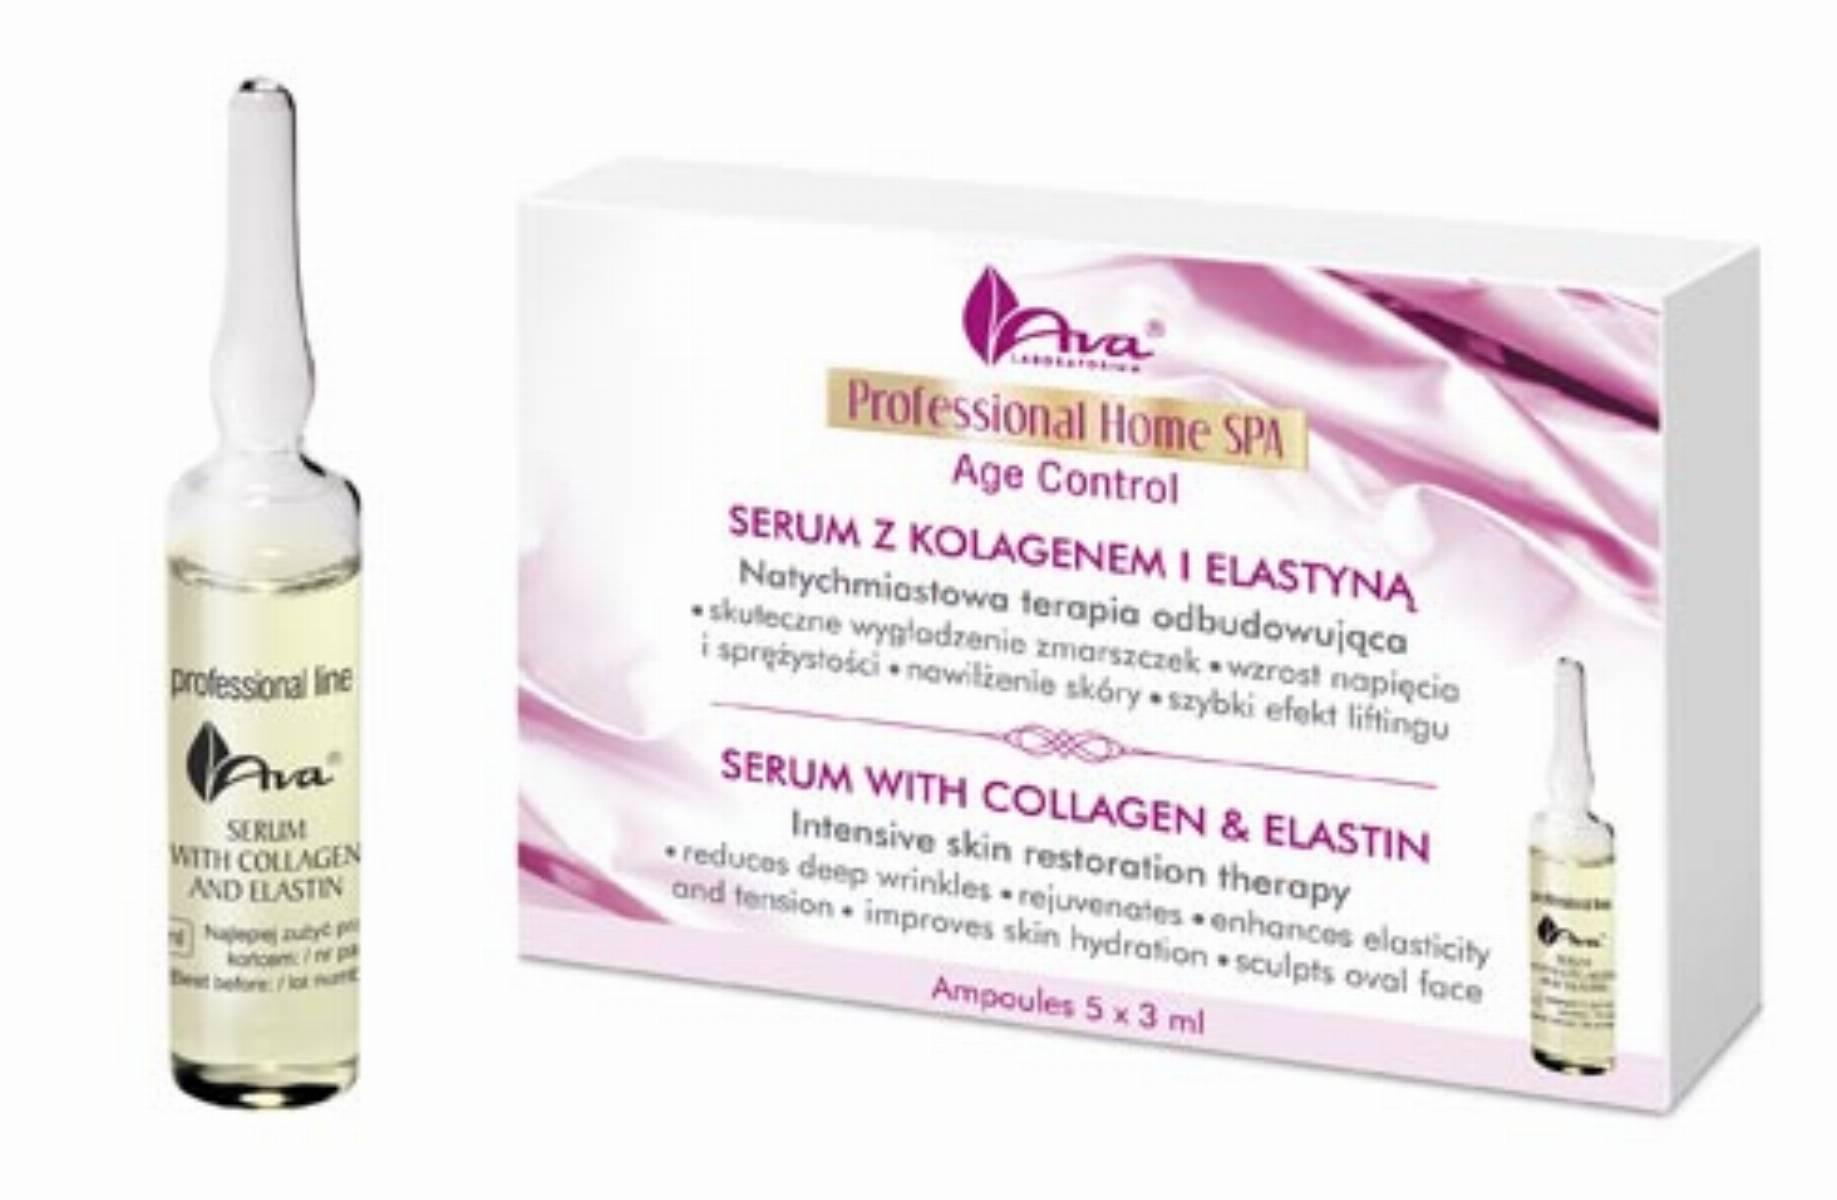 Ava - Serum z kolagenem i elastyną Professional Home SPA